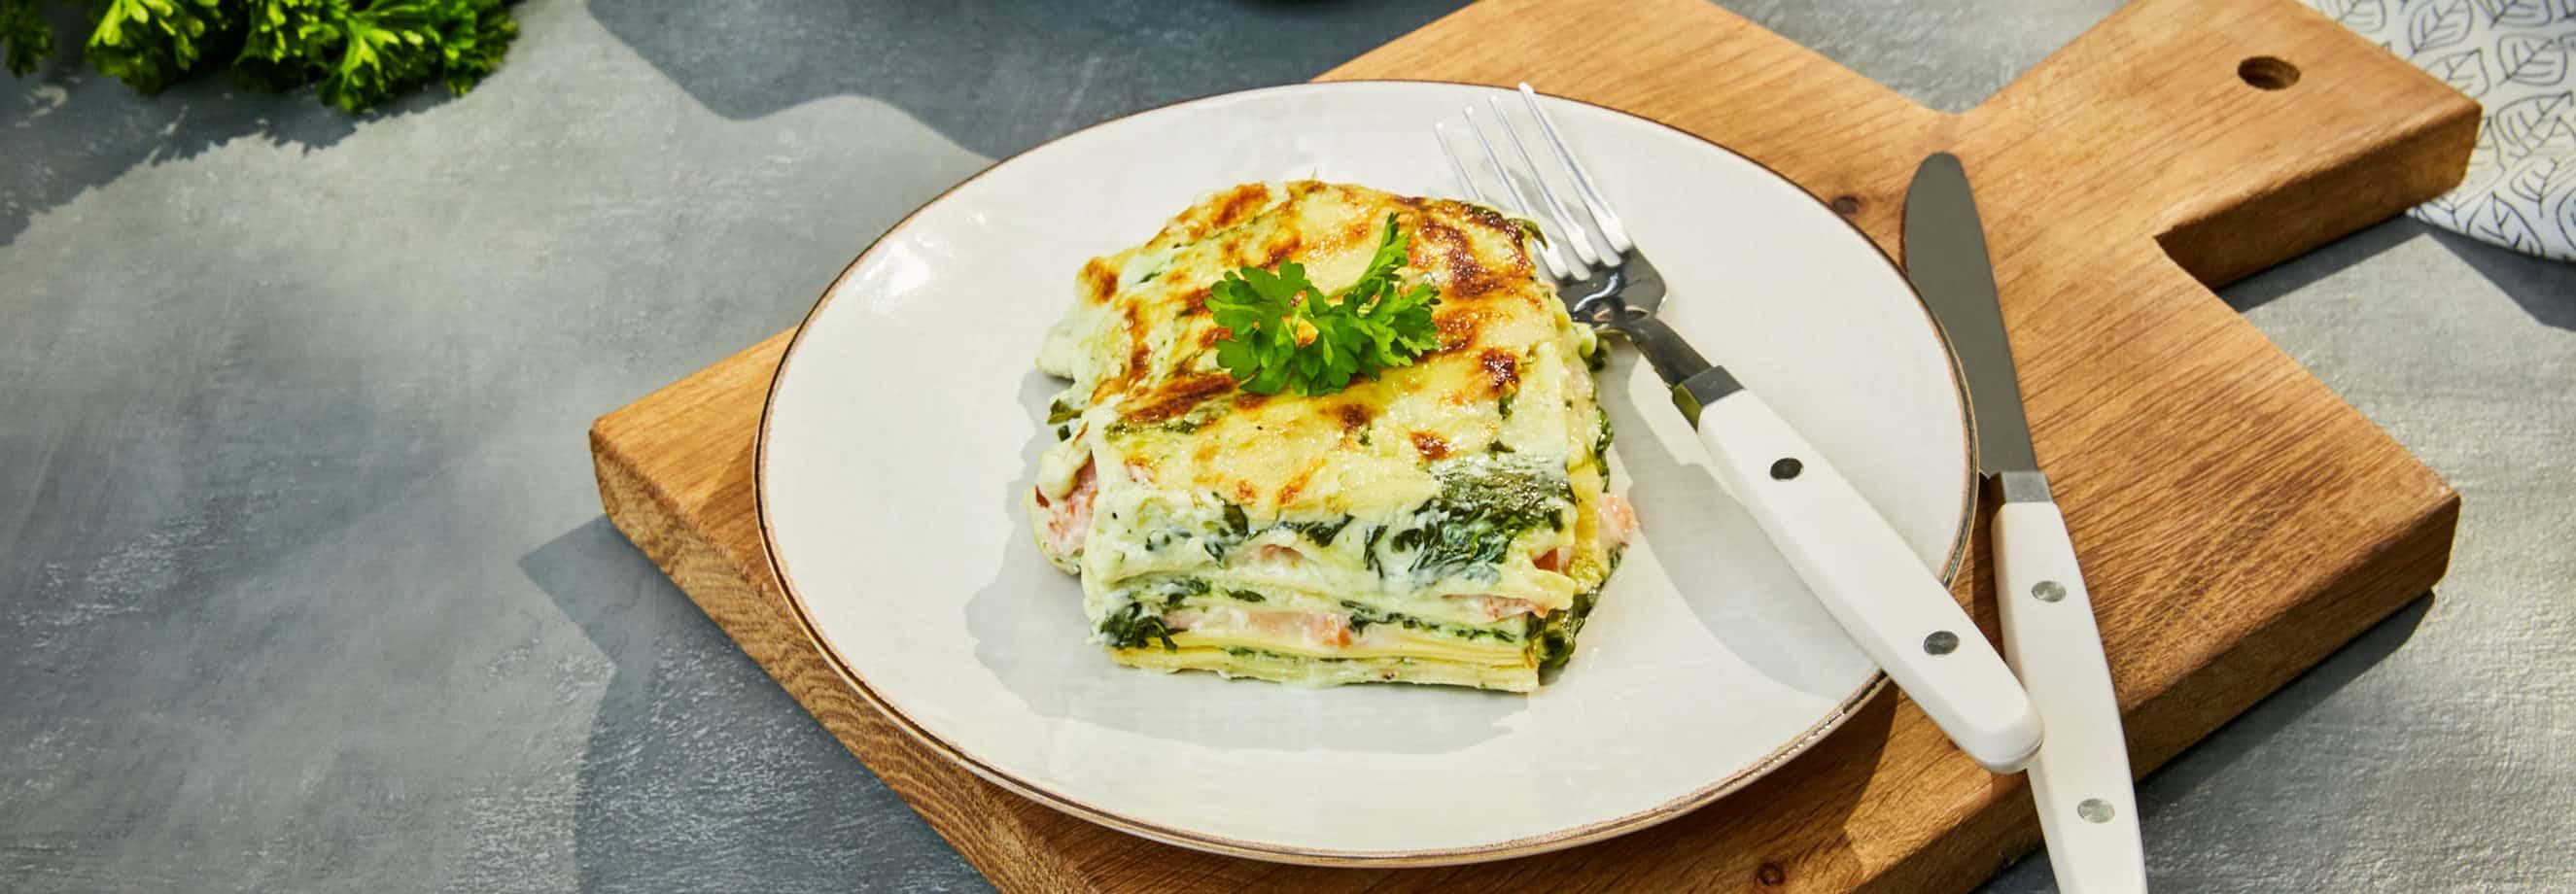 Comment Conserver Les Lasagnes ? - Galbani